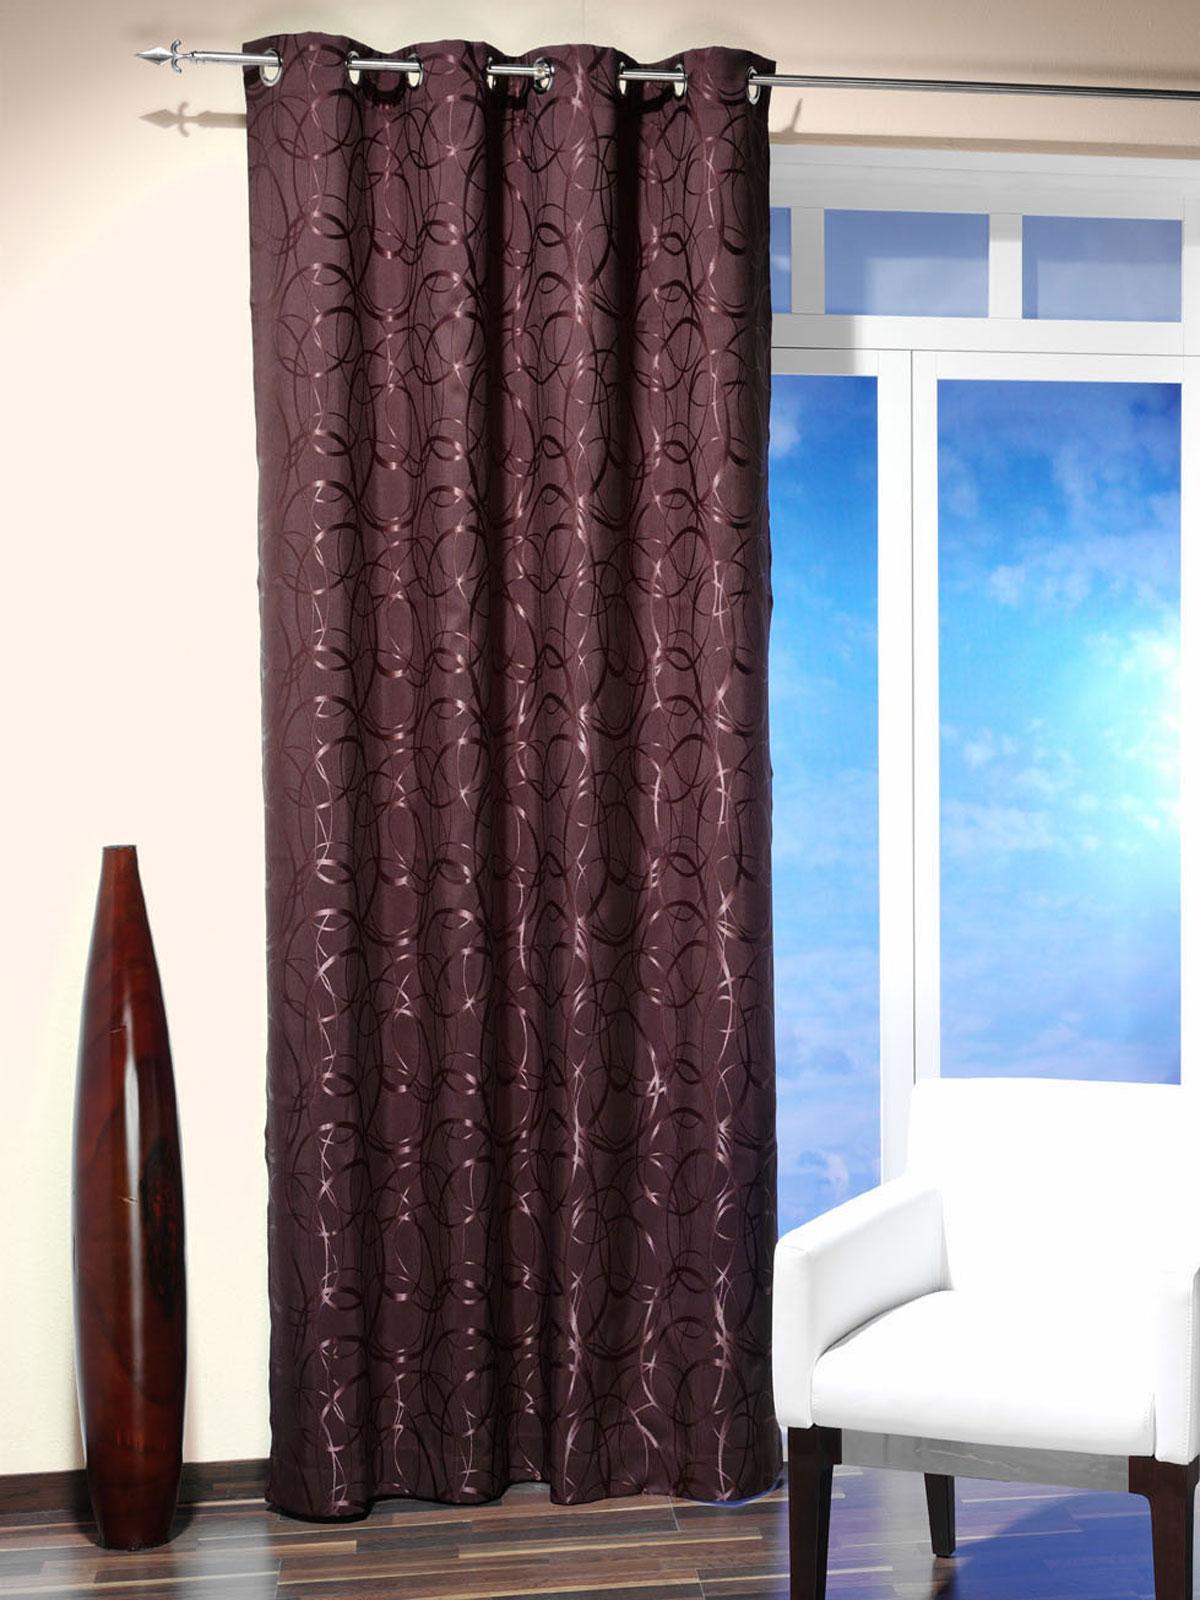 senschal vorhang gardine blickdicht 135 x 245cm dekoschal. Black Bedroom Furniture Sets. Home Design Ideas